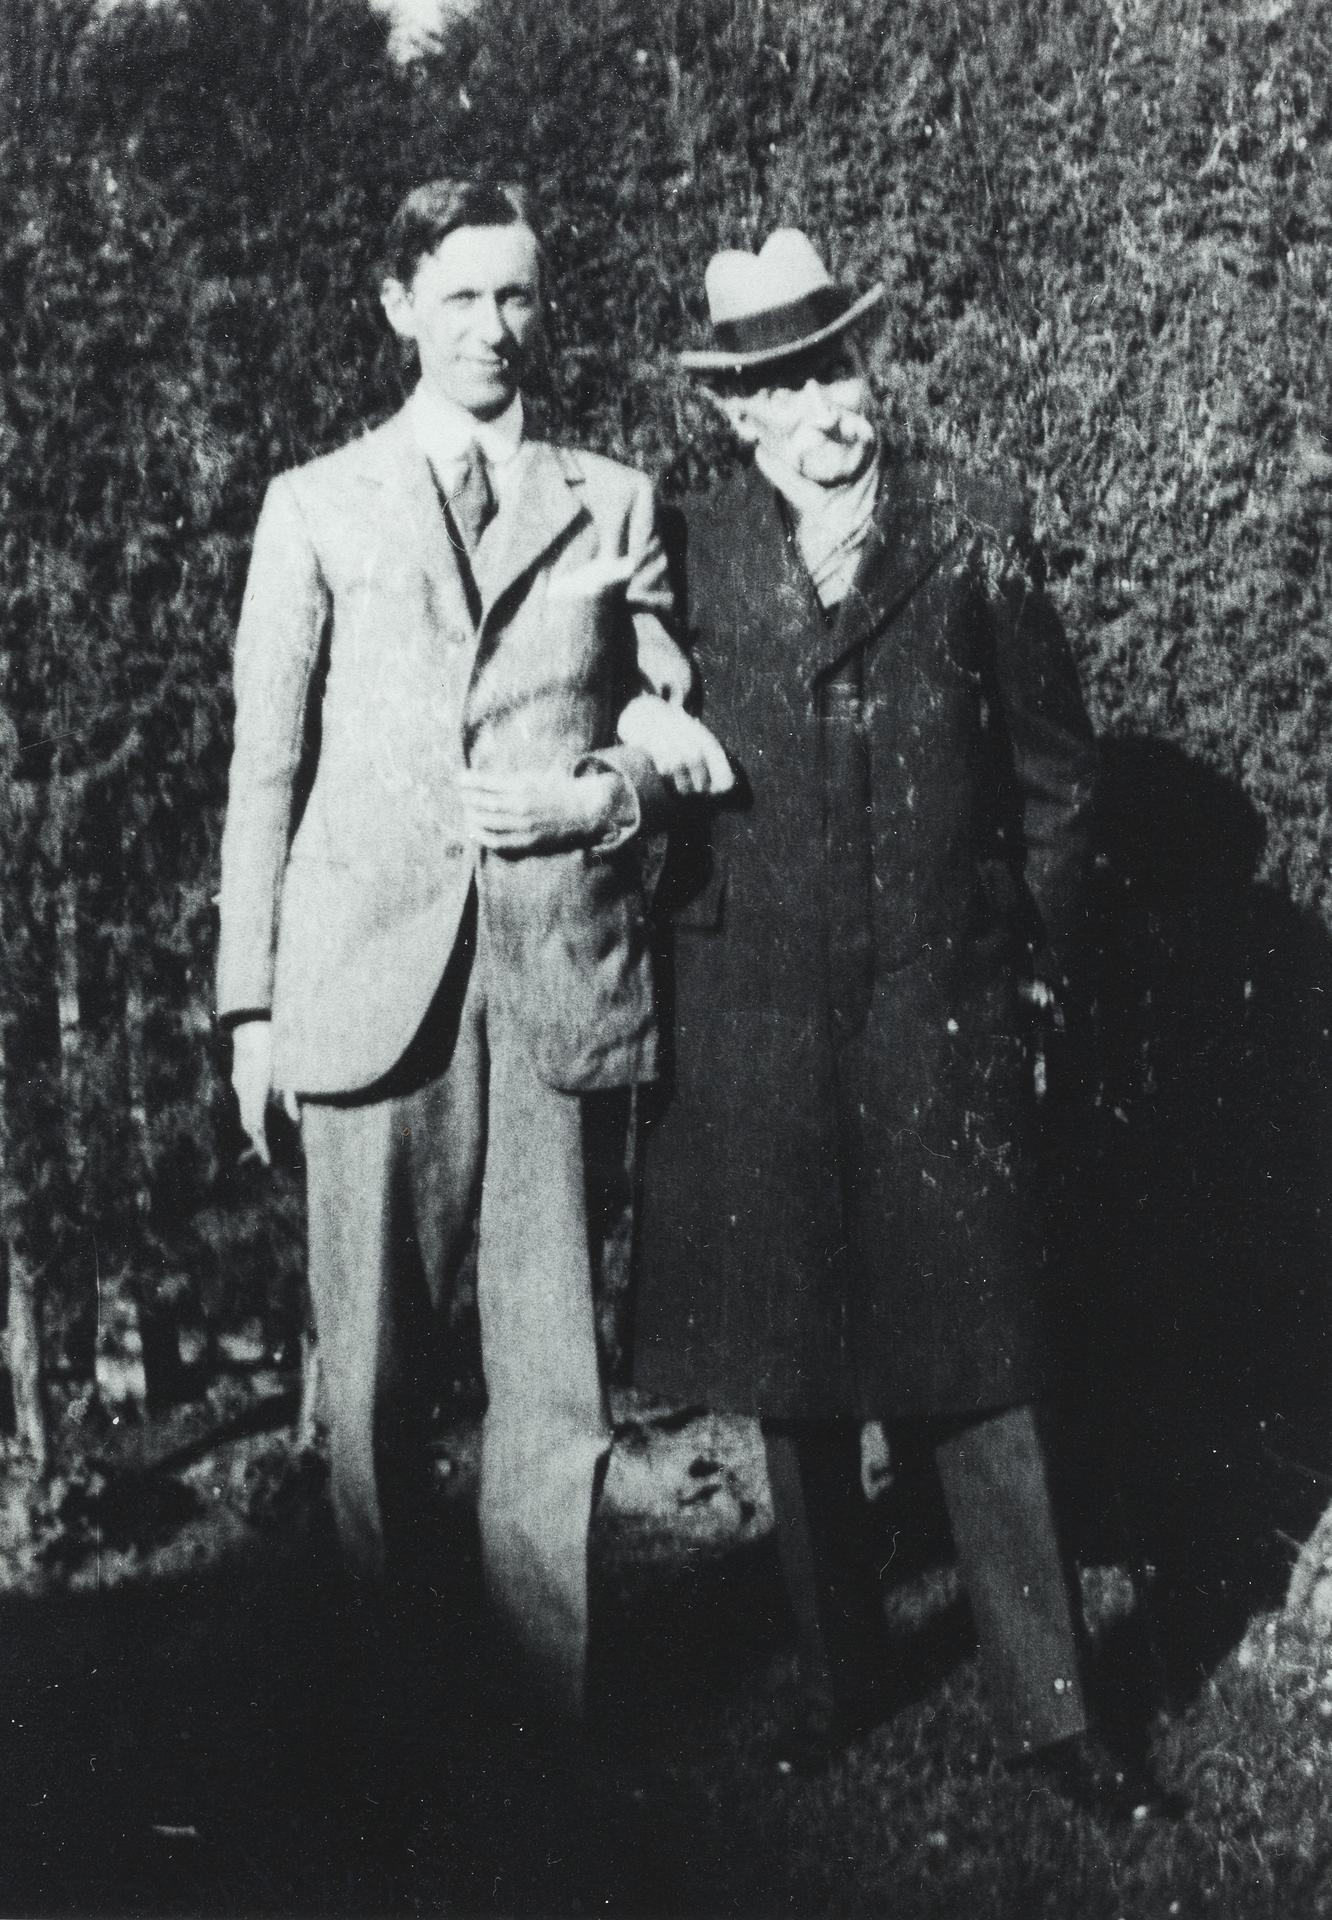 Alexander L. Leeper (right)